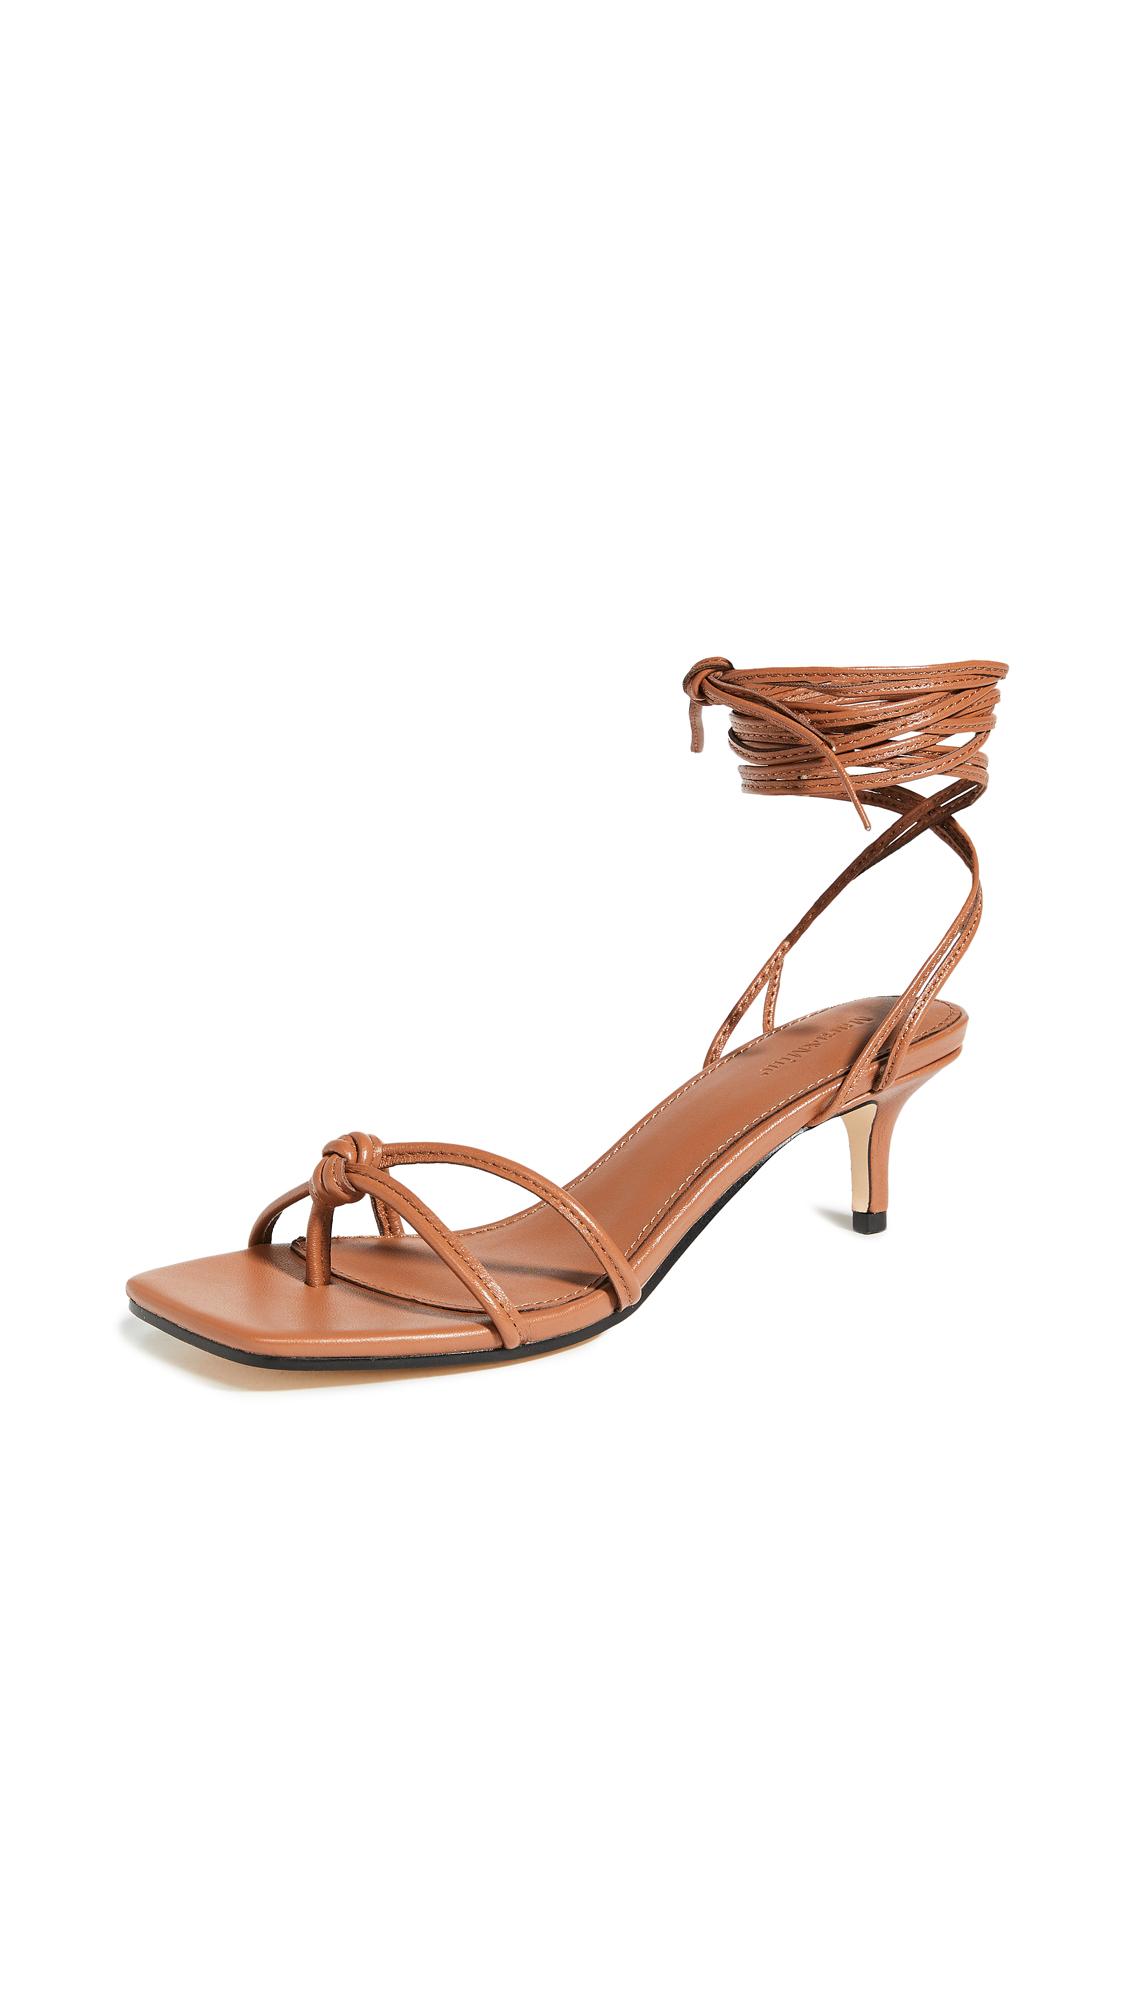 Buy Mara & Mine Olympia Kitten Heel Sandals online, shop Mara & Mine